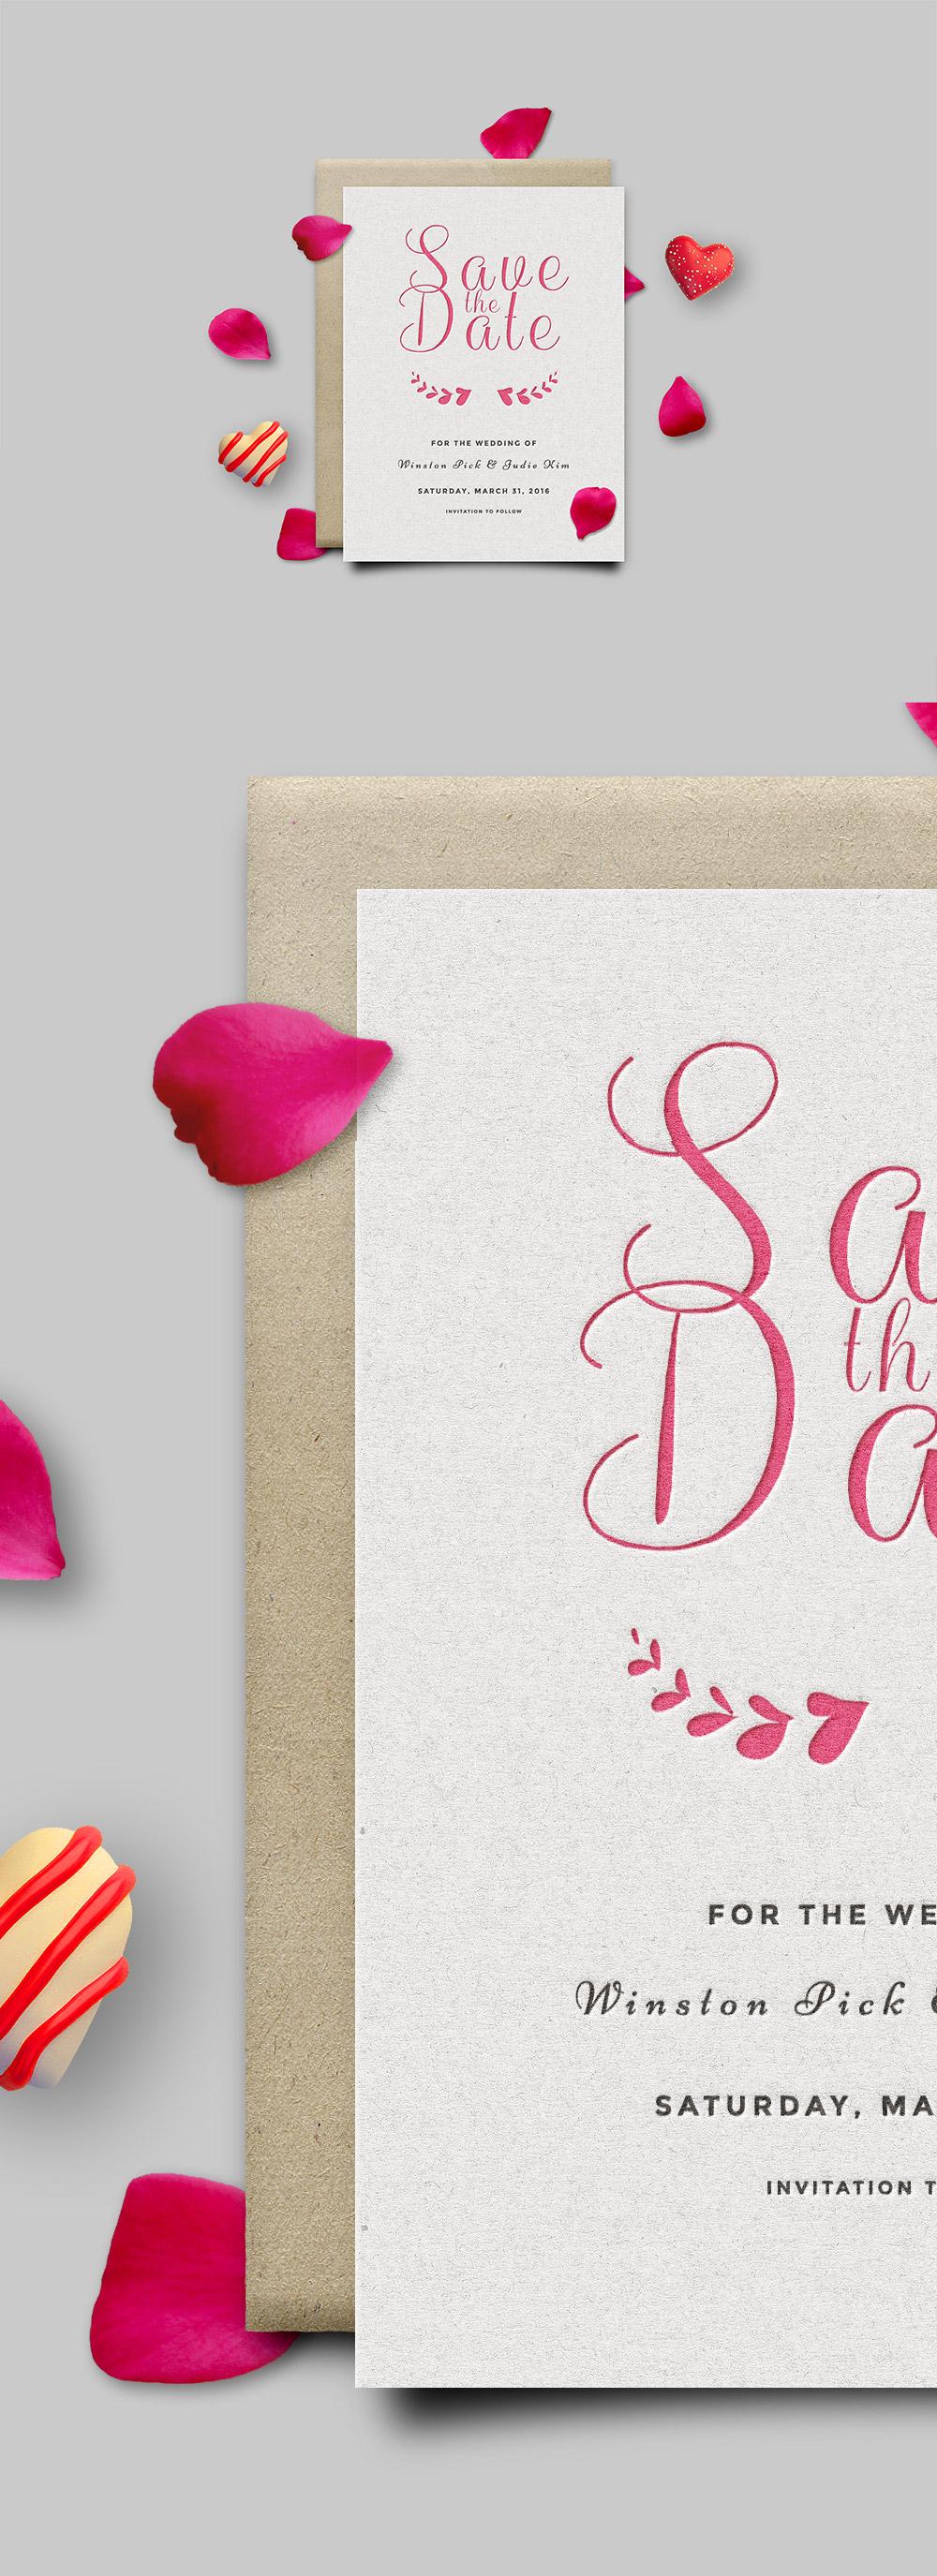 Save The Date Invitation Card Mockup